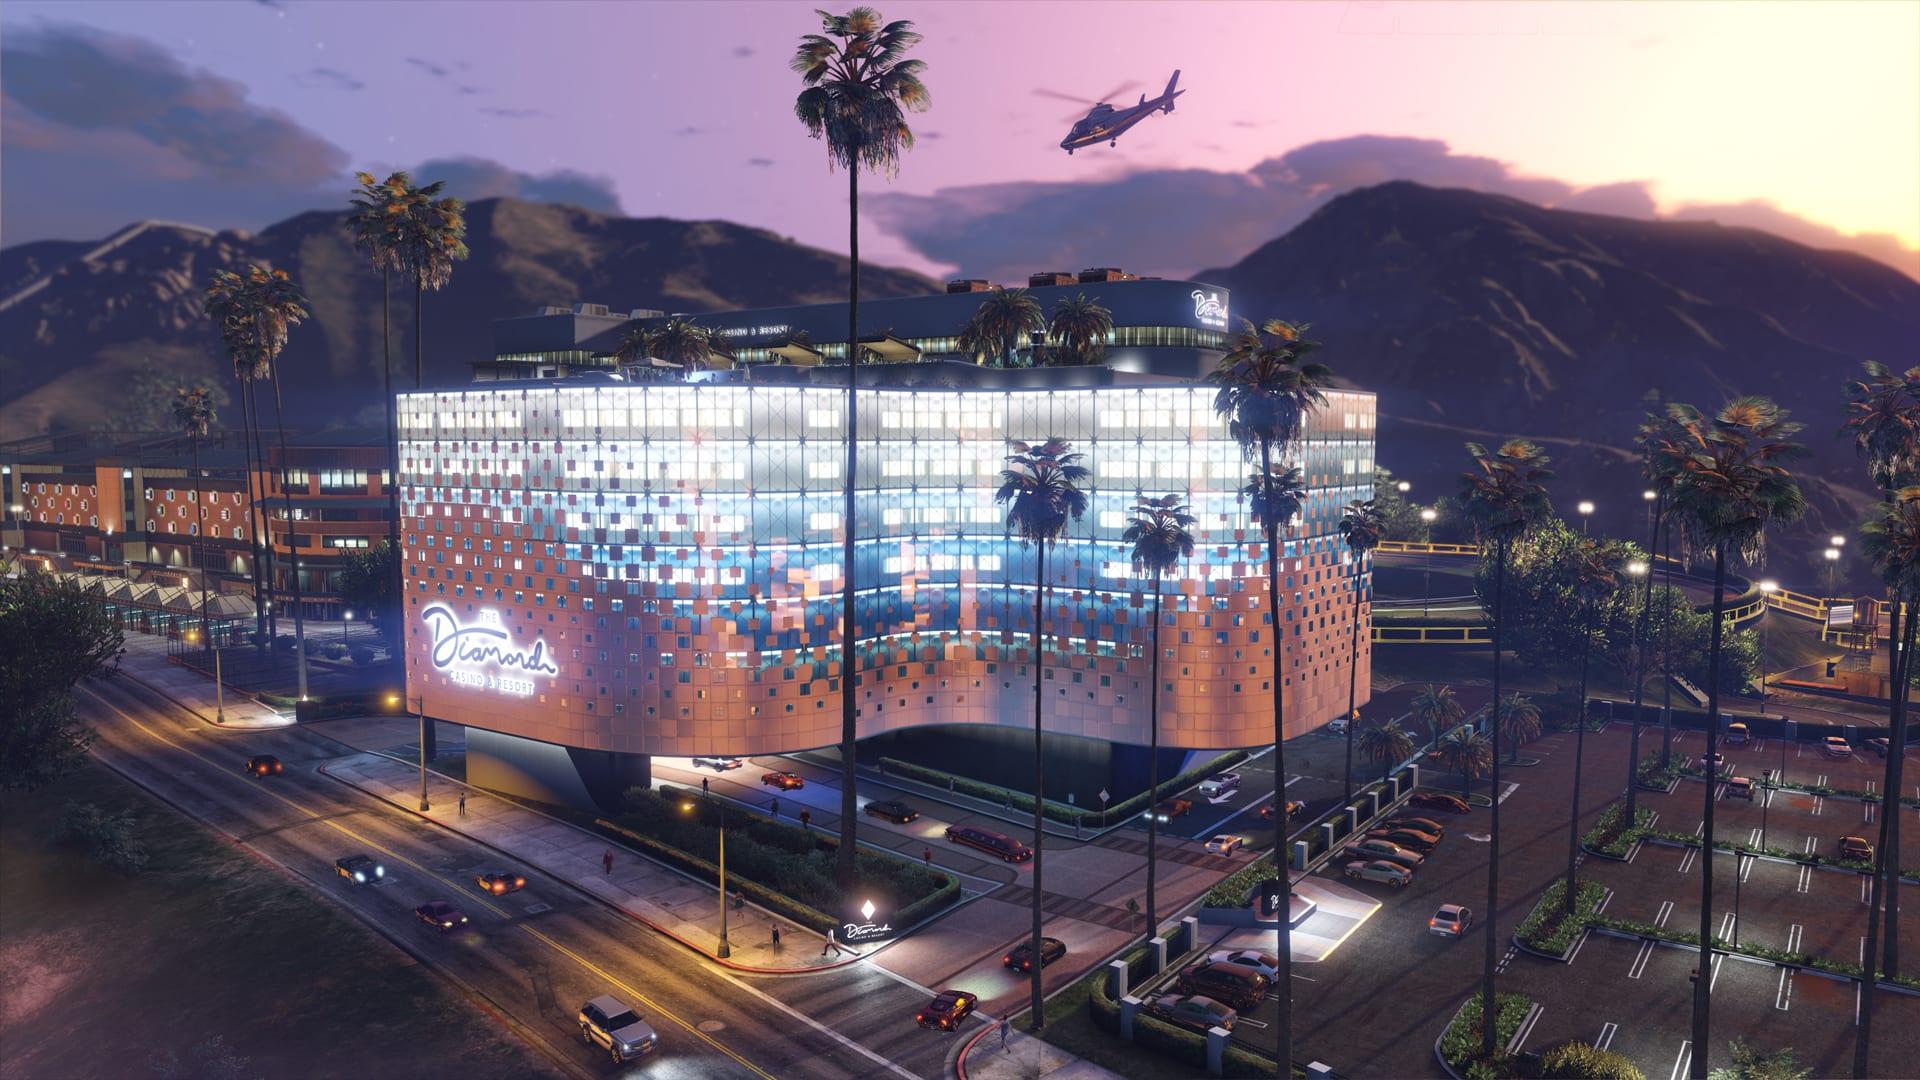 GTAOnline: The Diamond Casino & Resort